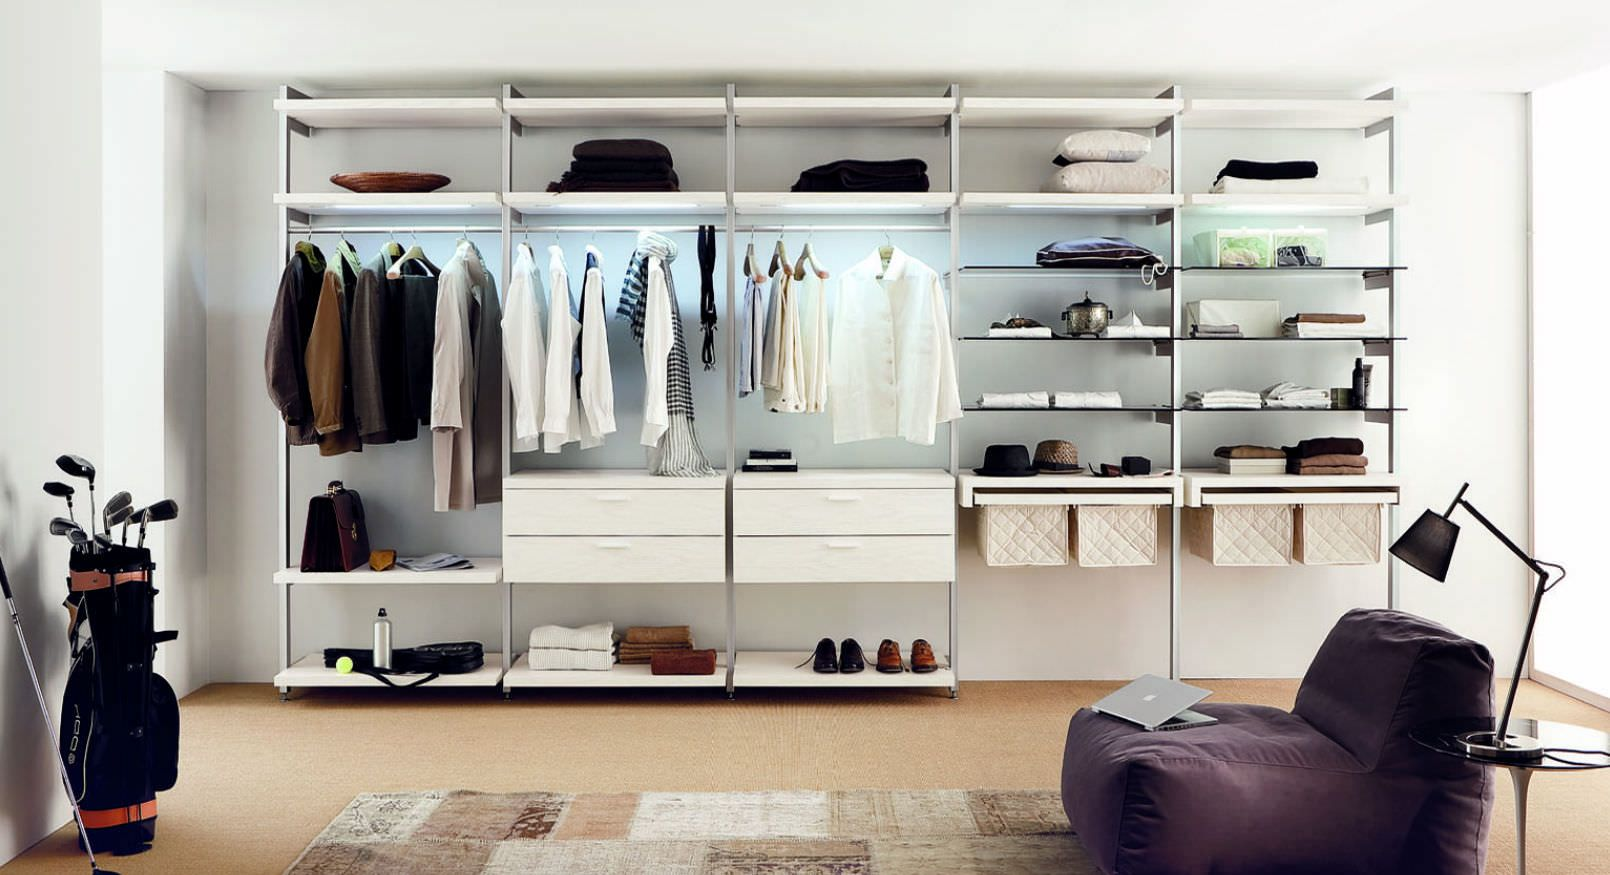 Begehbarer Kleiderschrank Modern Holz Kloset K02 Md House